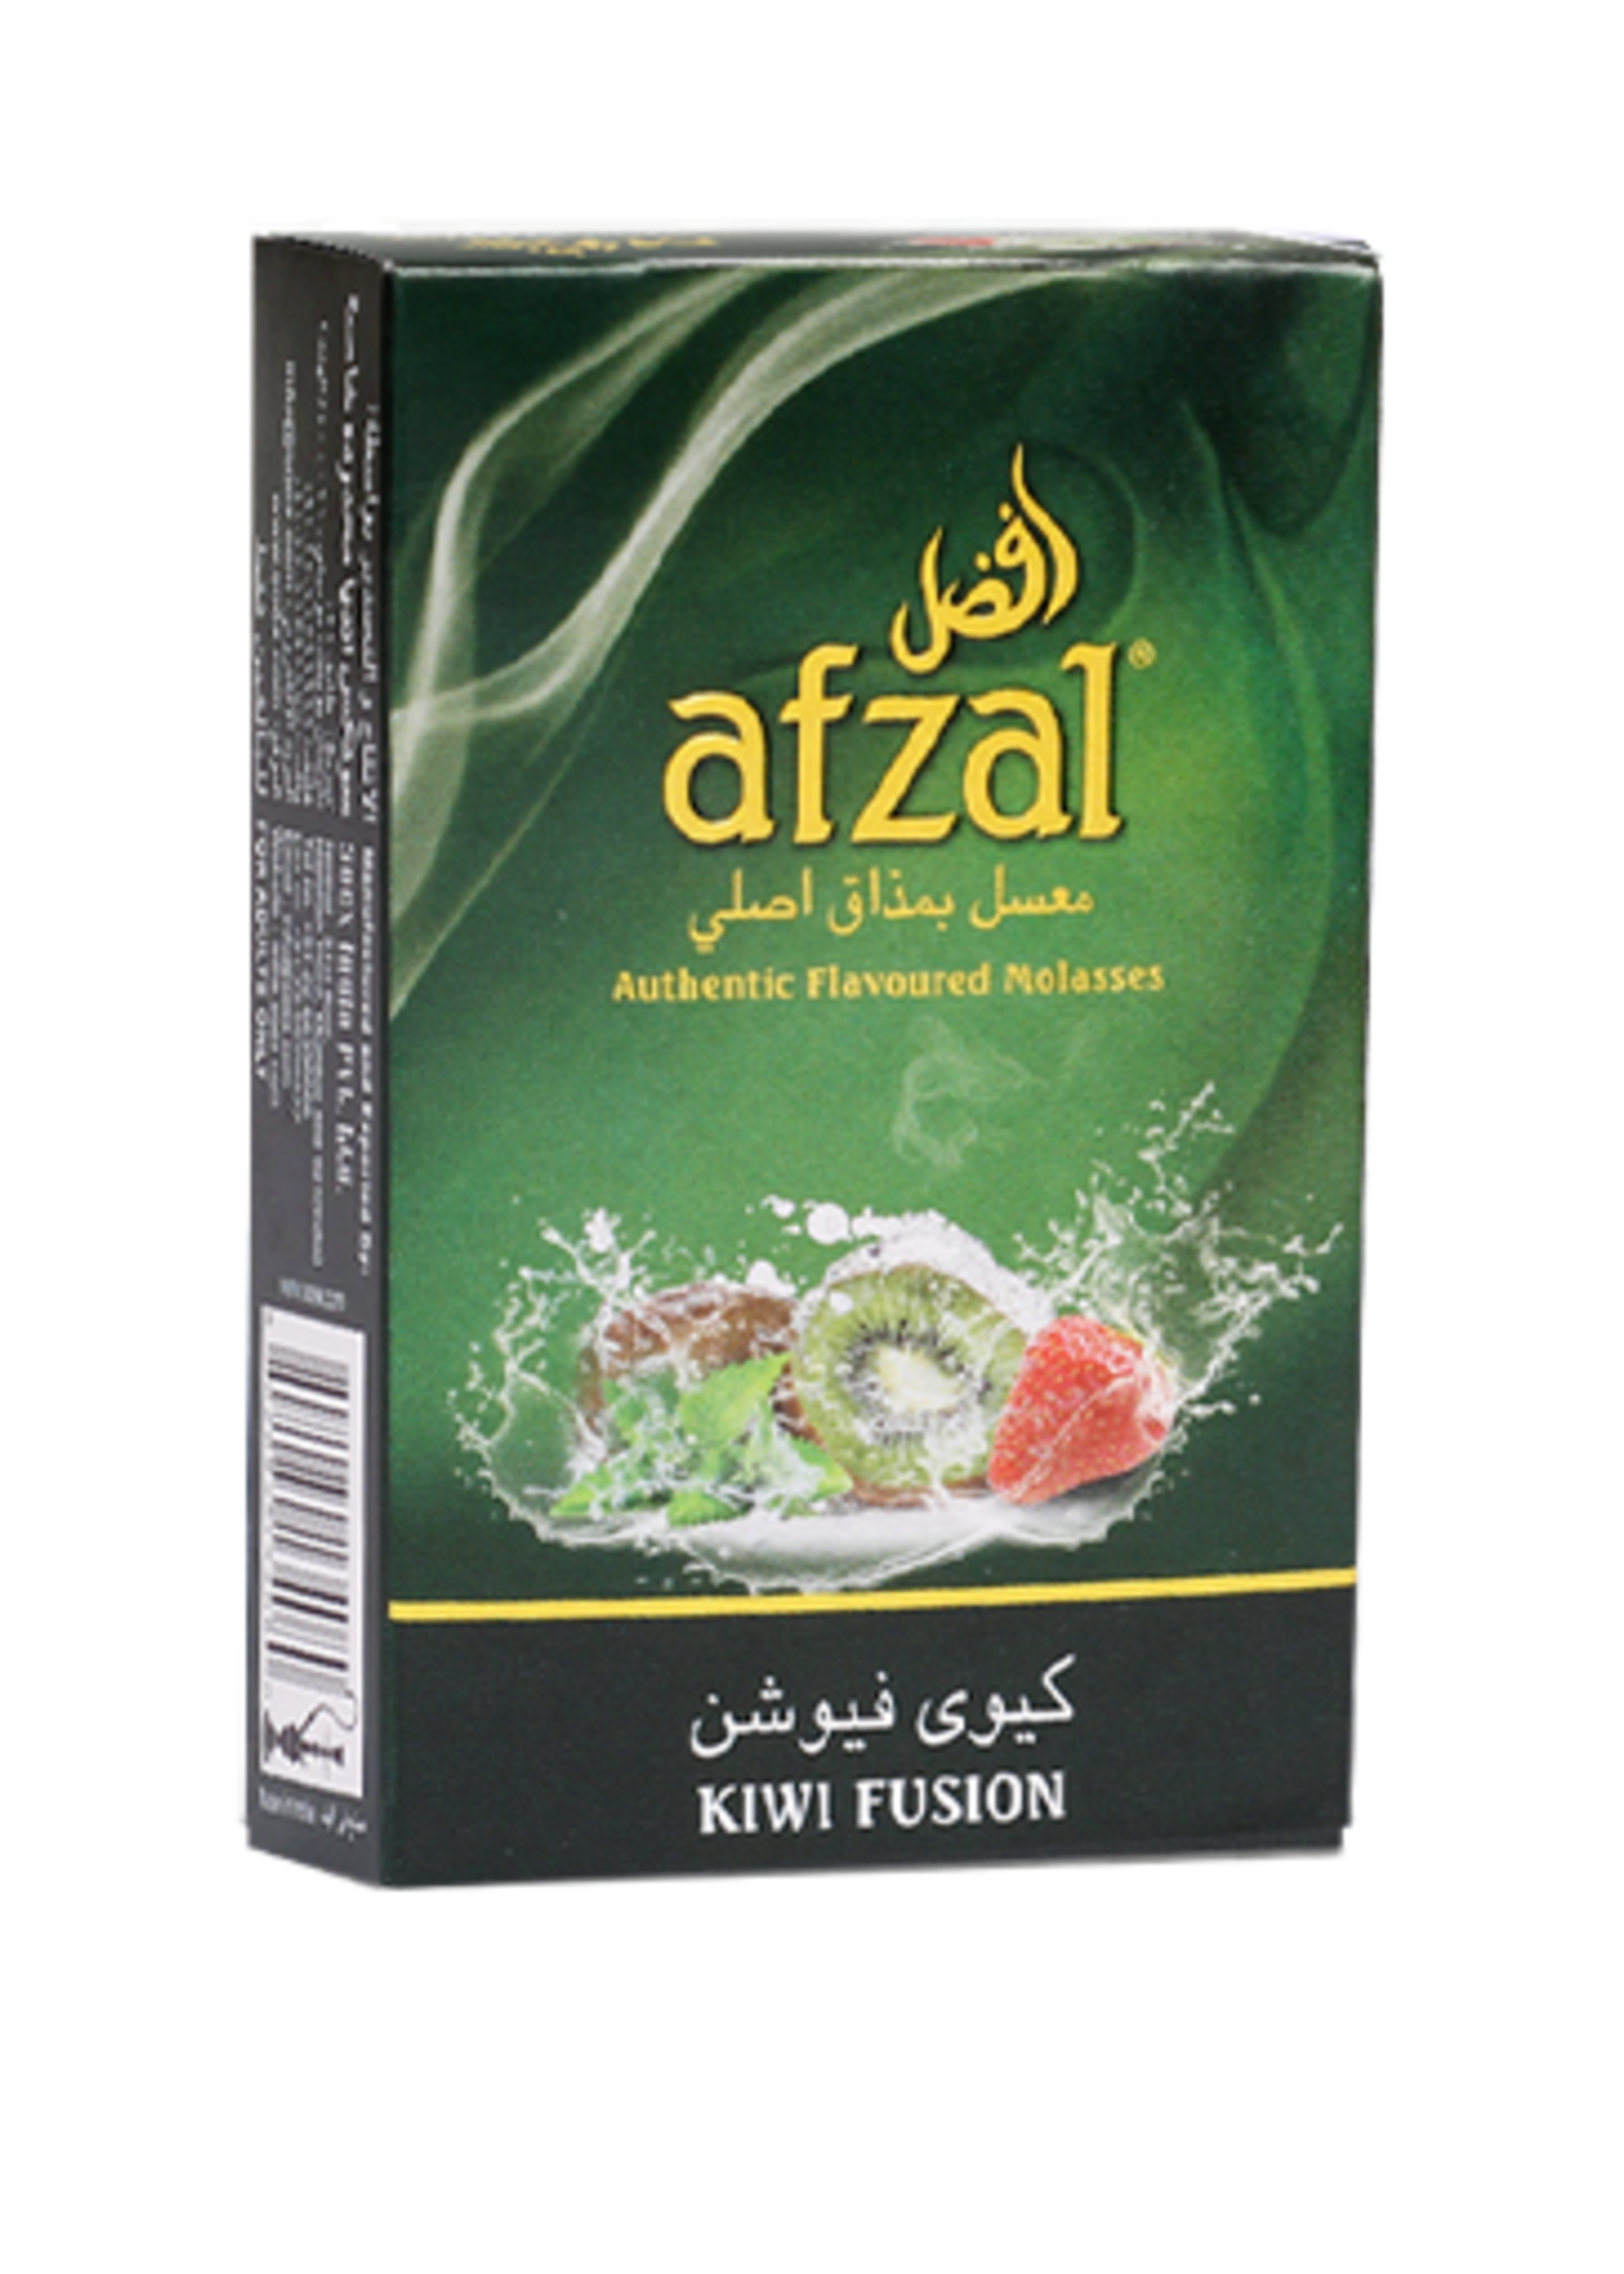 Afzal hubbly flavour - kiwi fusion